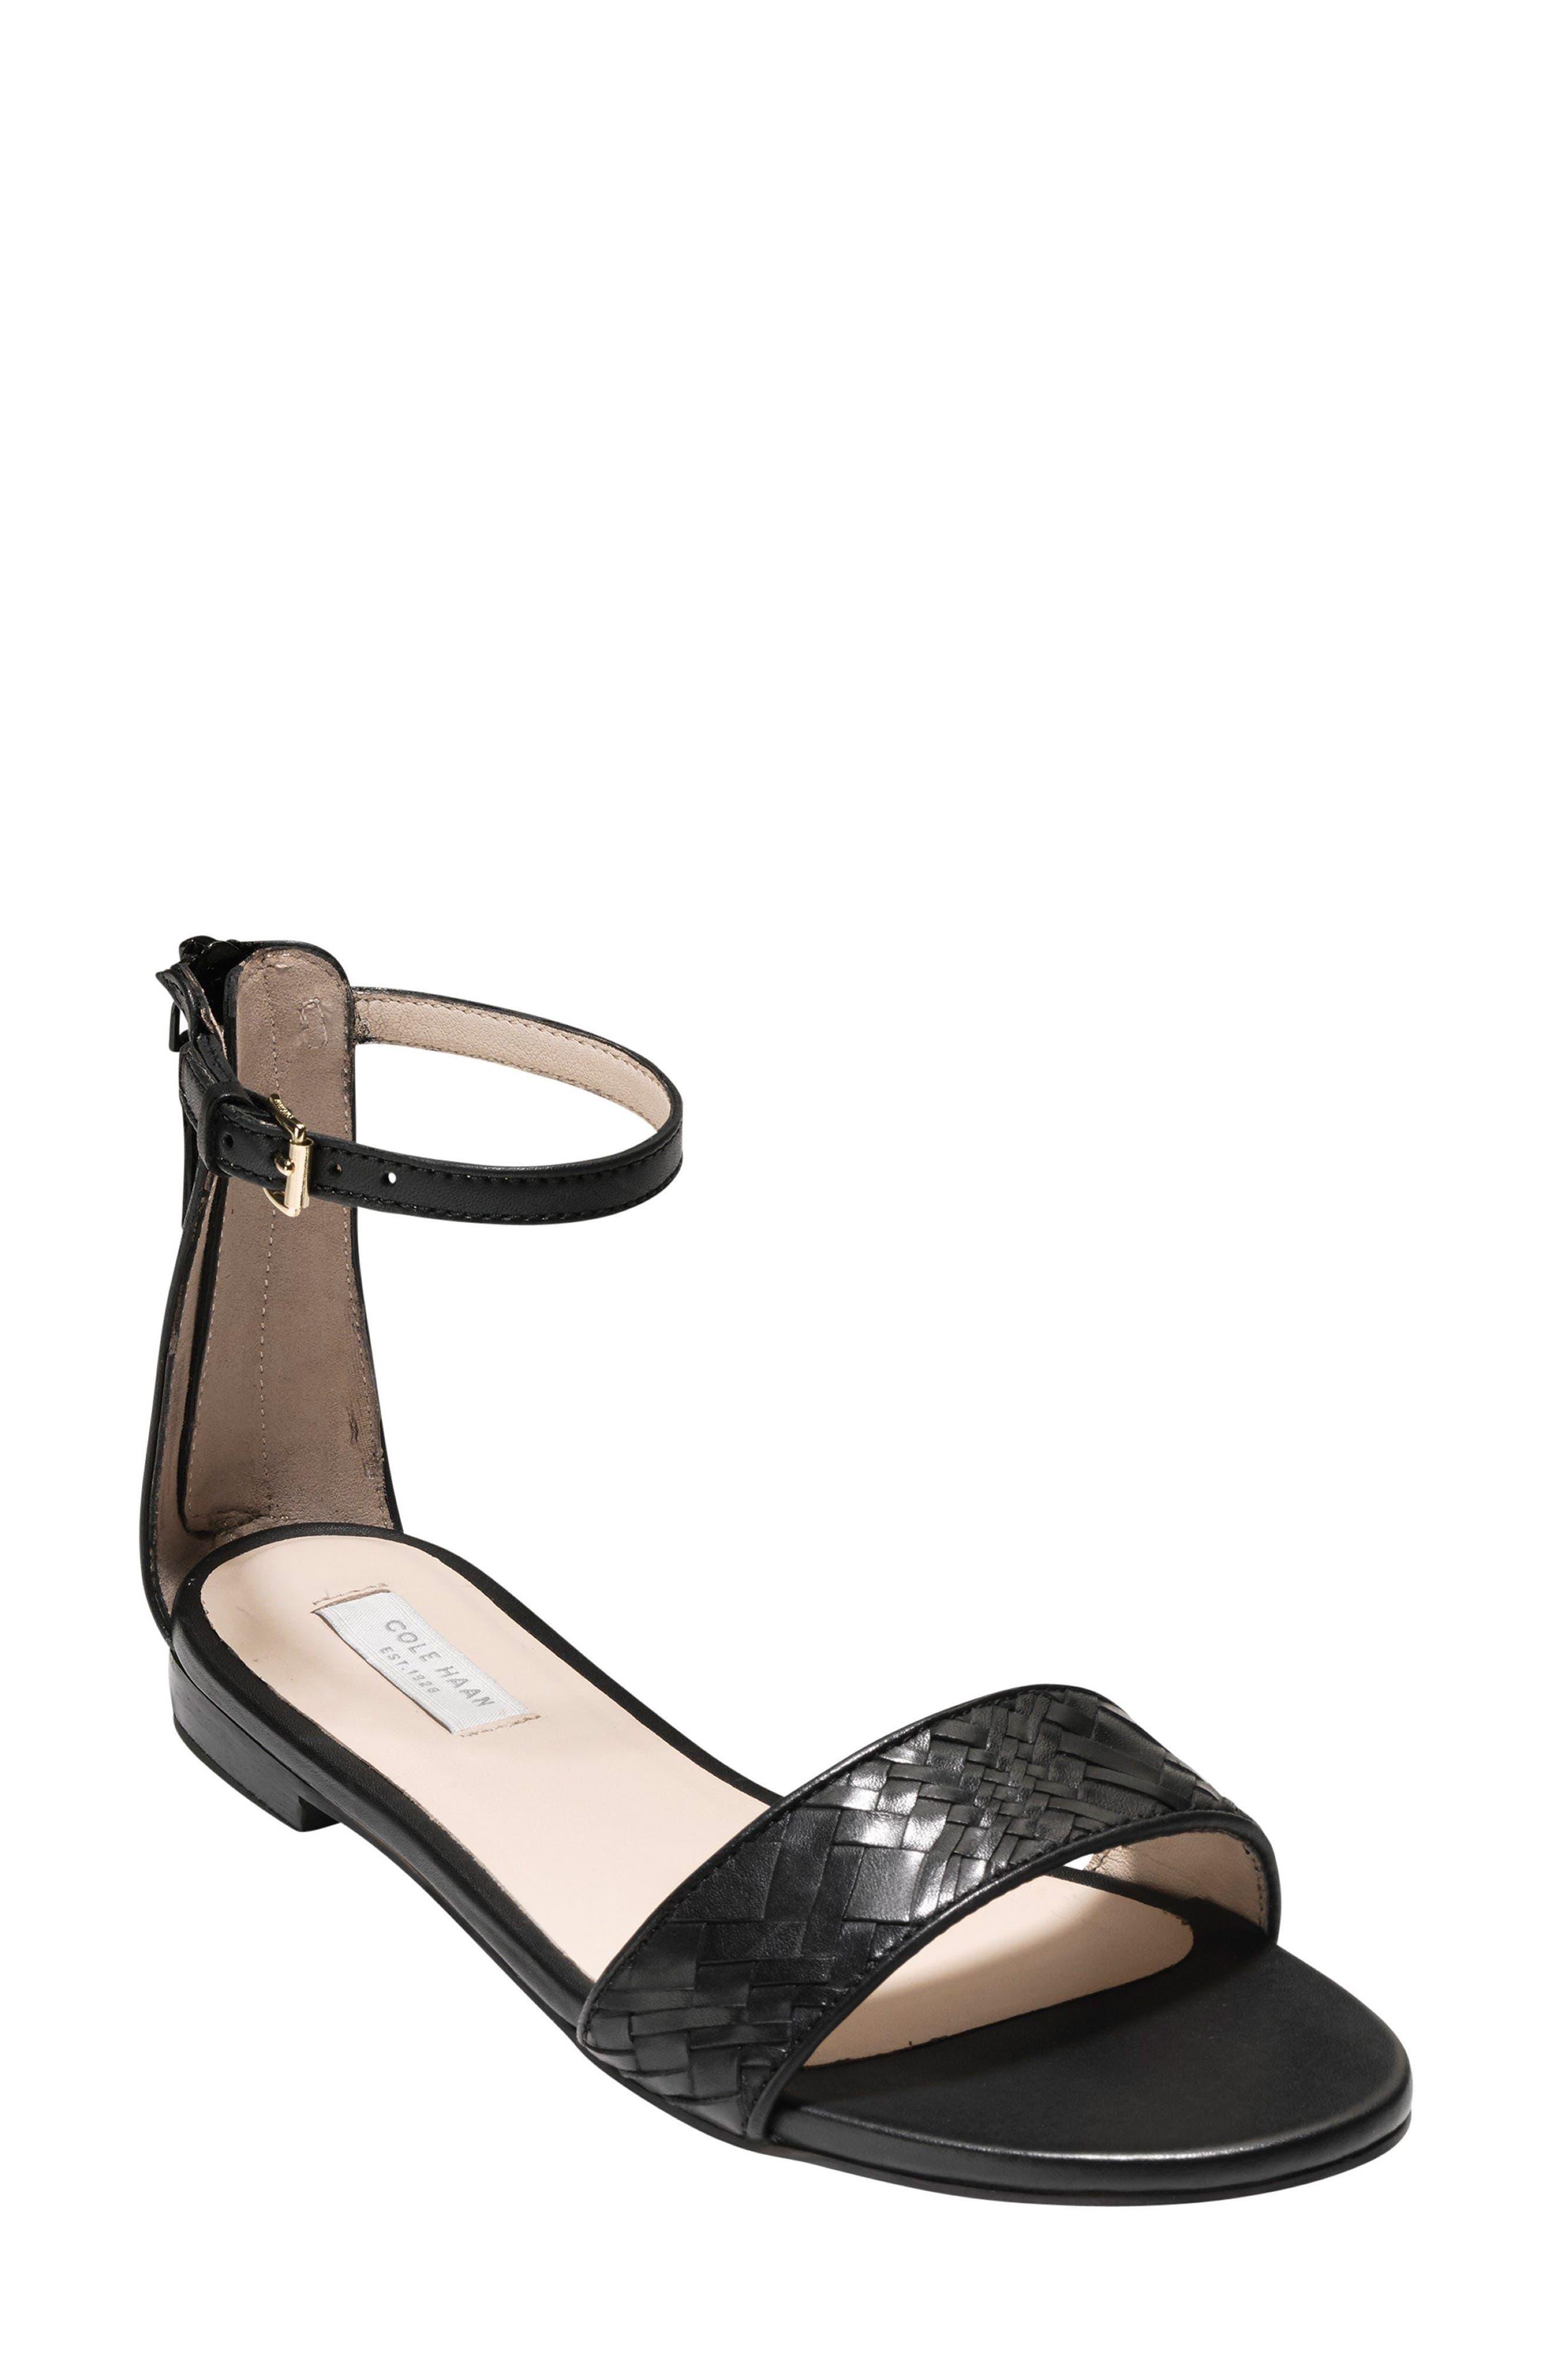 Genevieve Sandal,                         Main,                         color, Black/ Black Leather